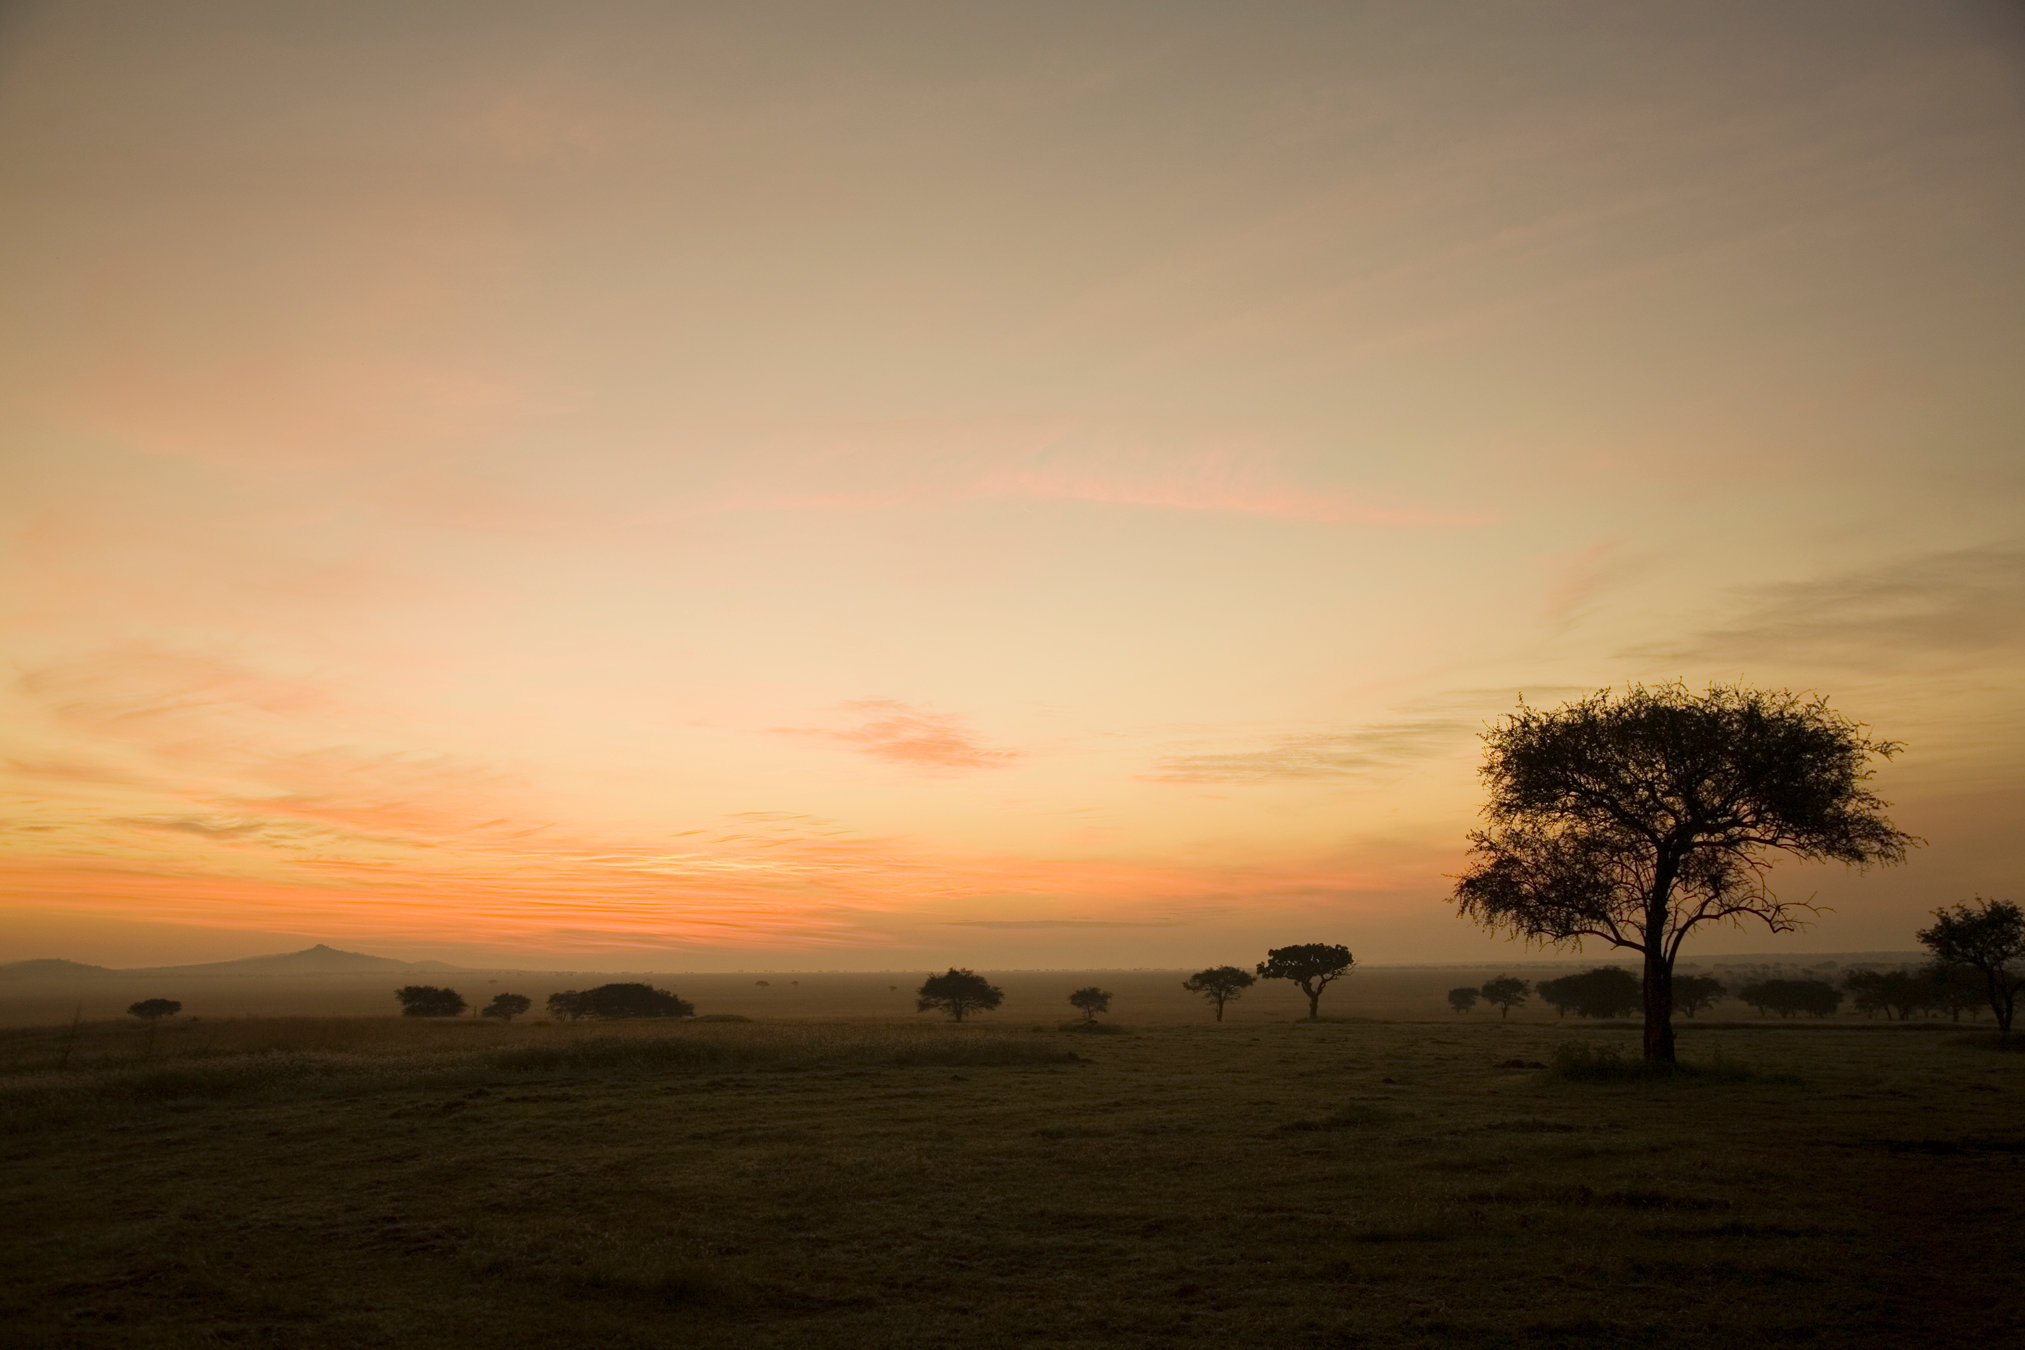 sunrise.tif